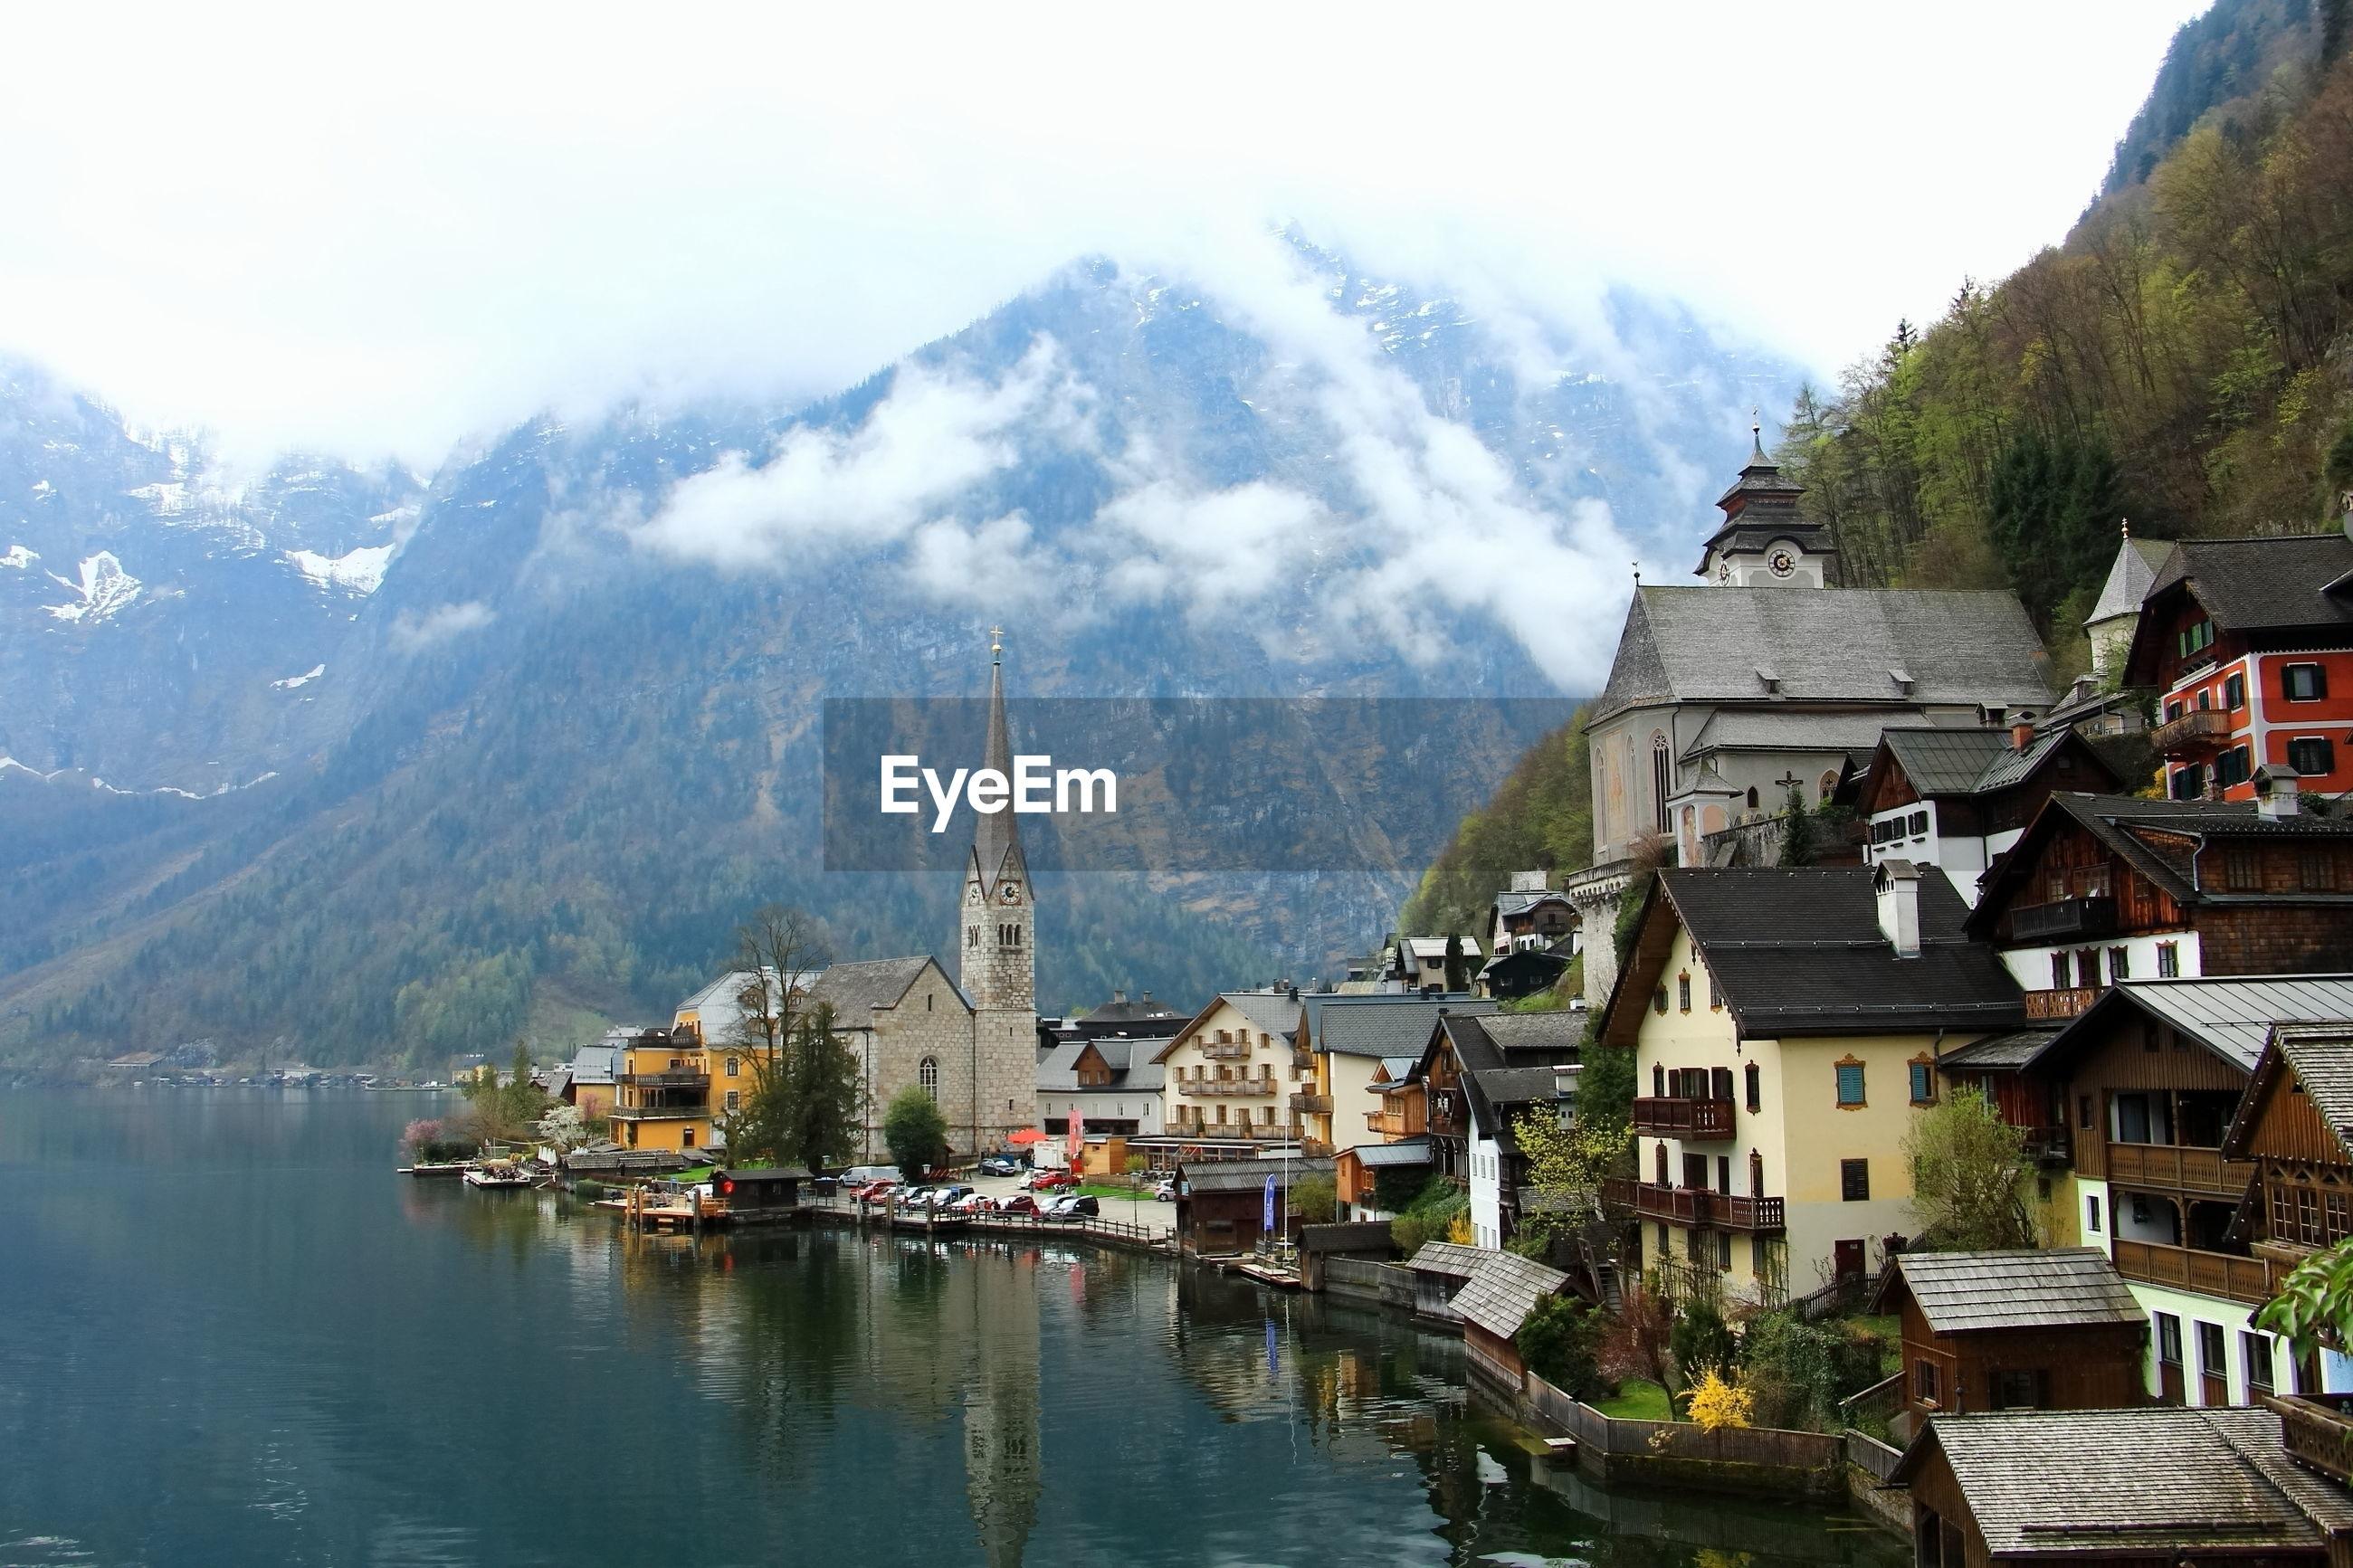 Hallstatt mountain village with hallstatter. hallstatt is unesco world culture heritage.